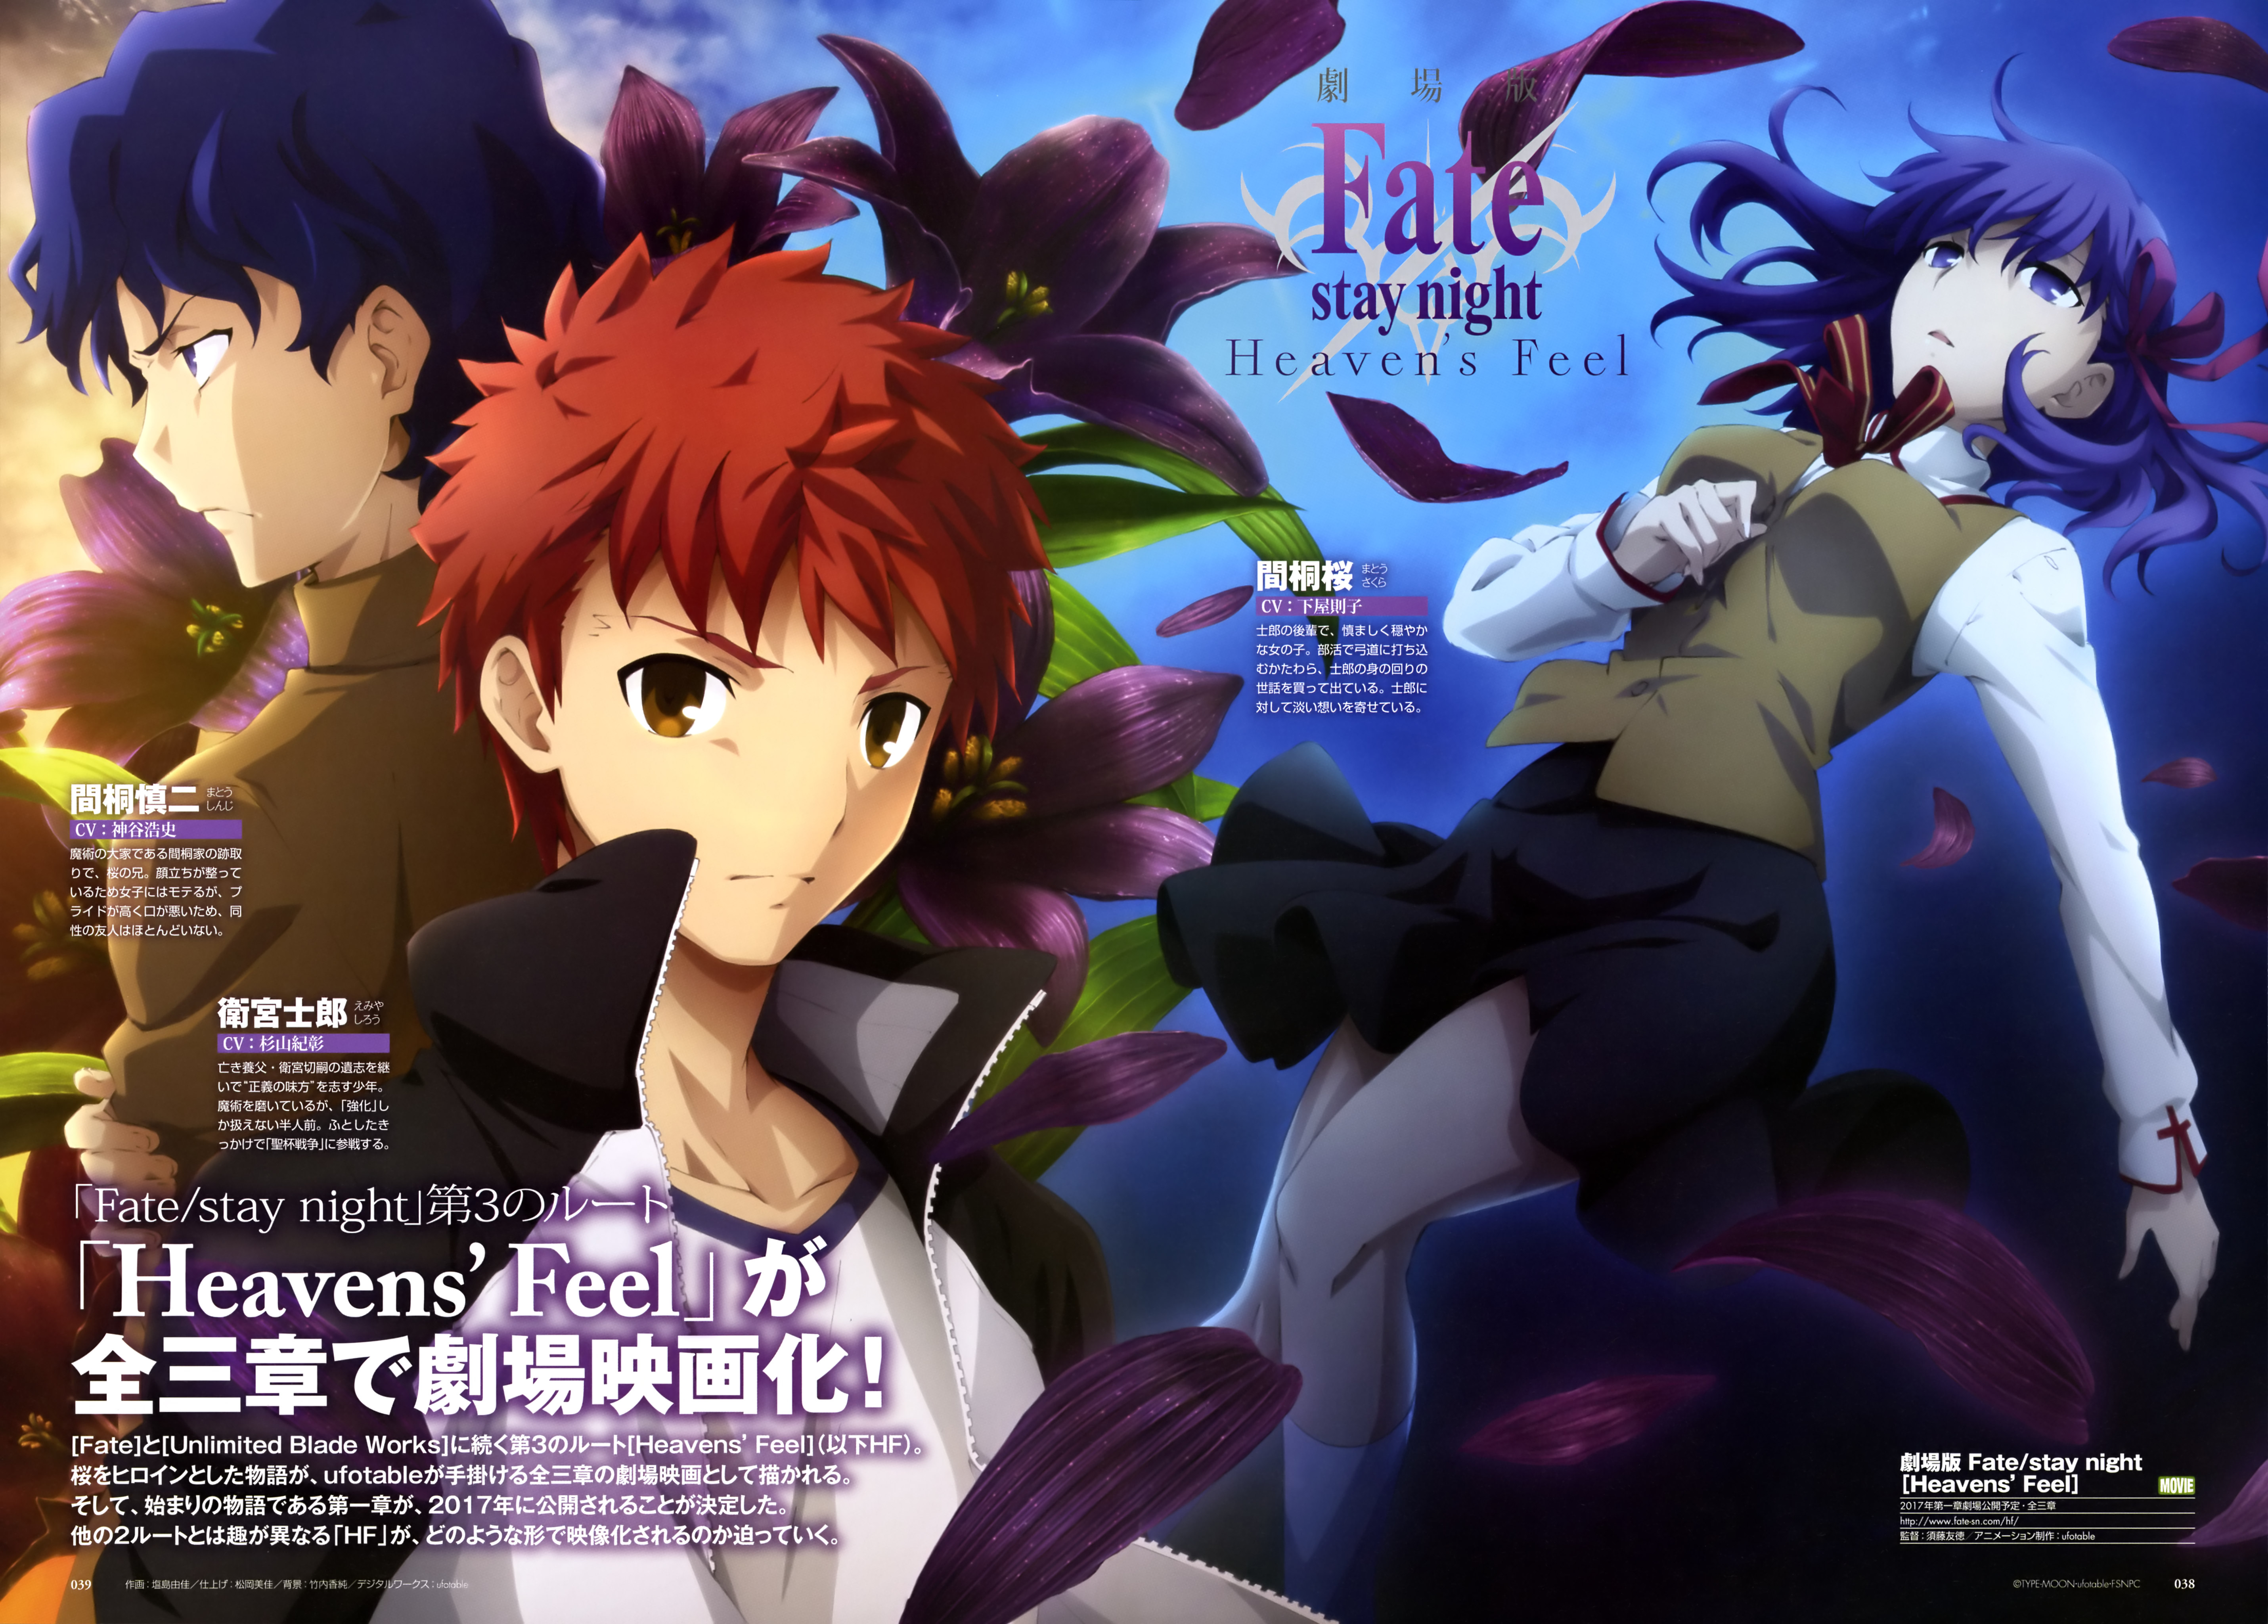 Fate Stay Night Heaven's Feel Visual Revealed